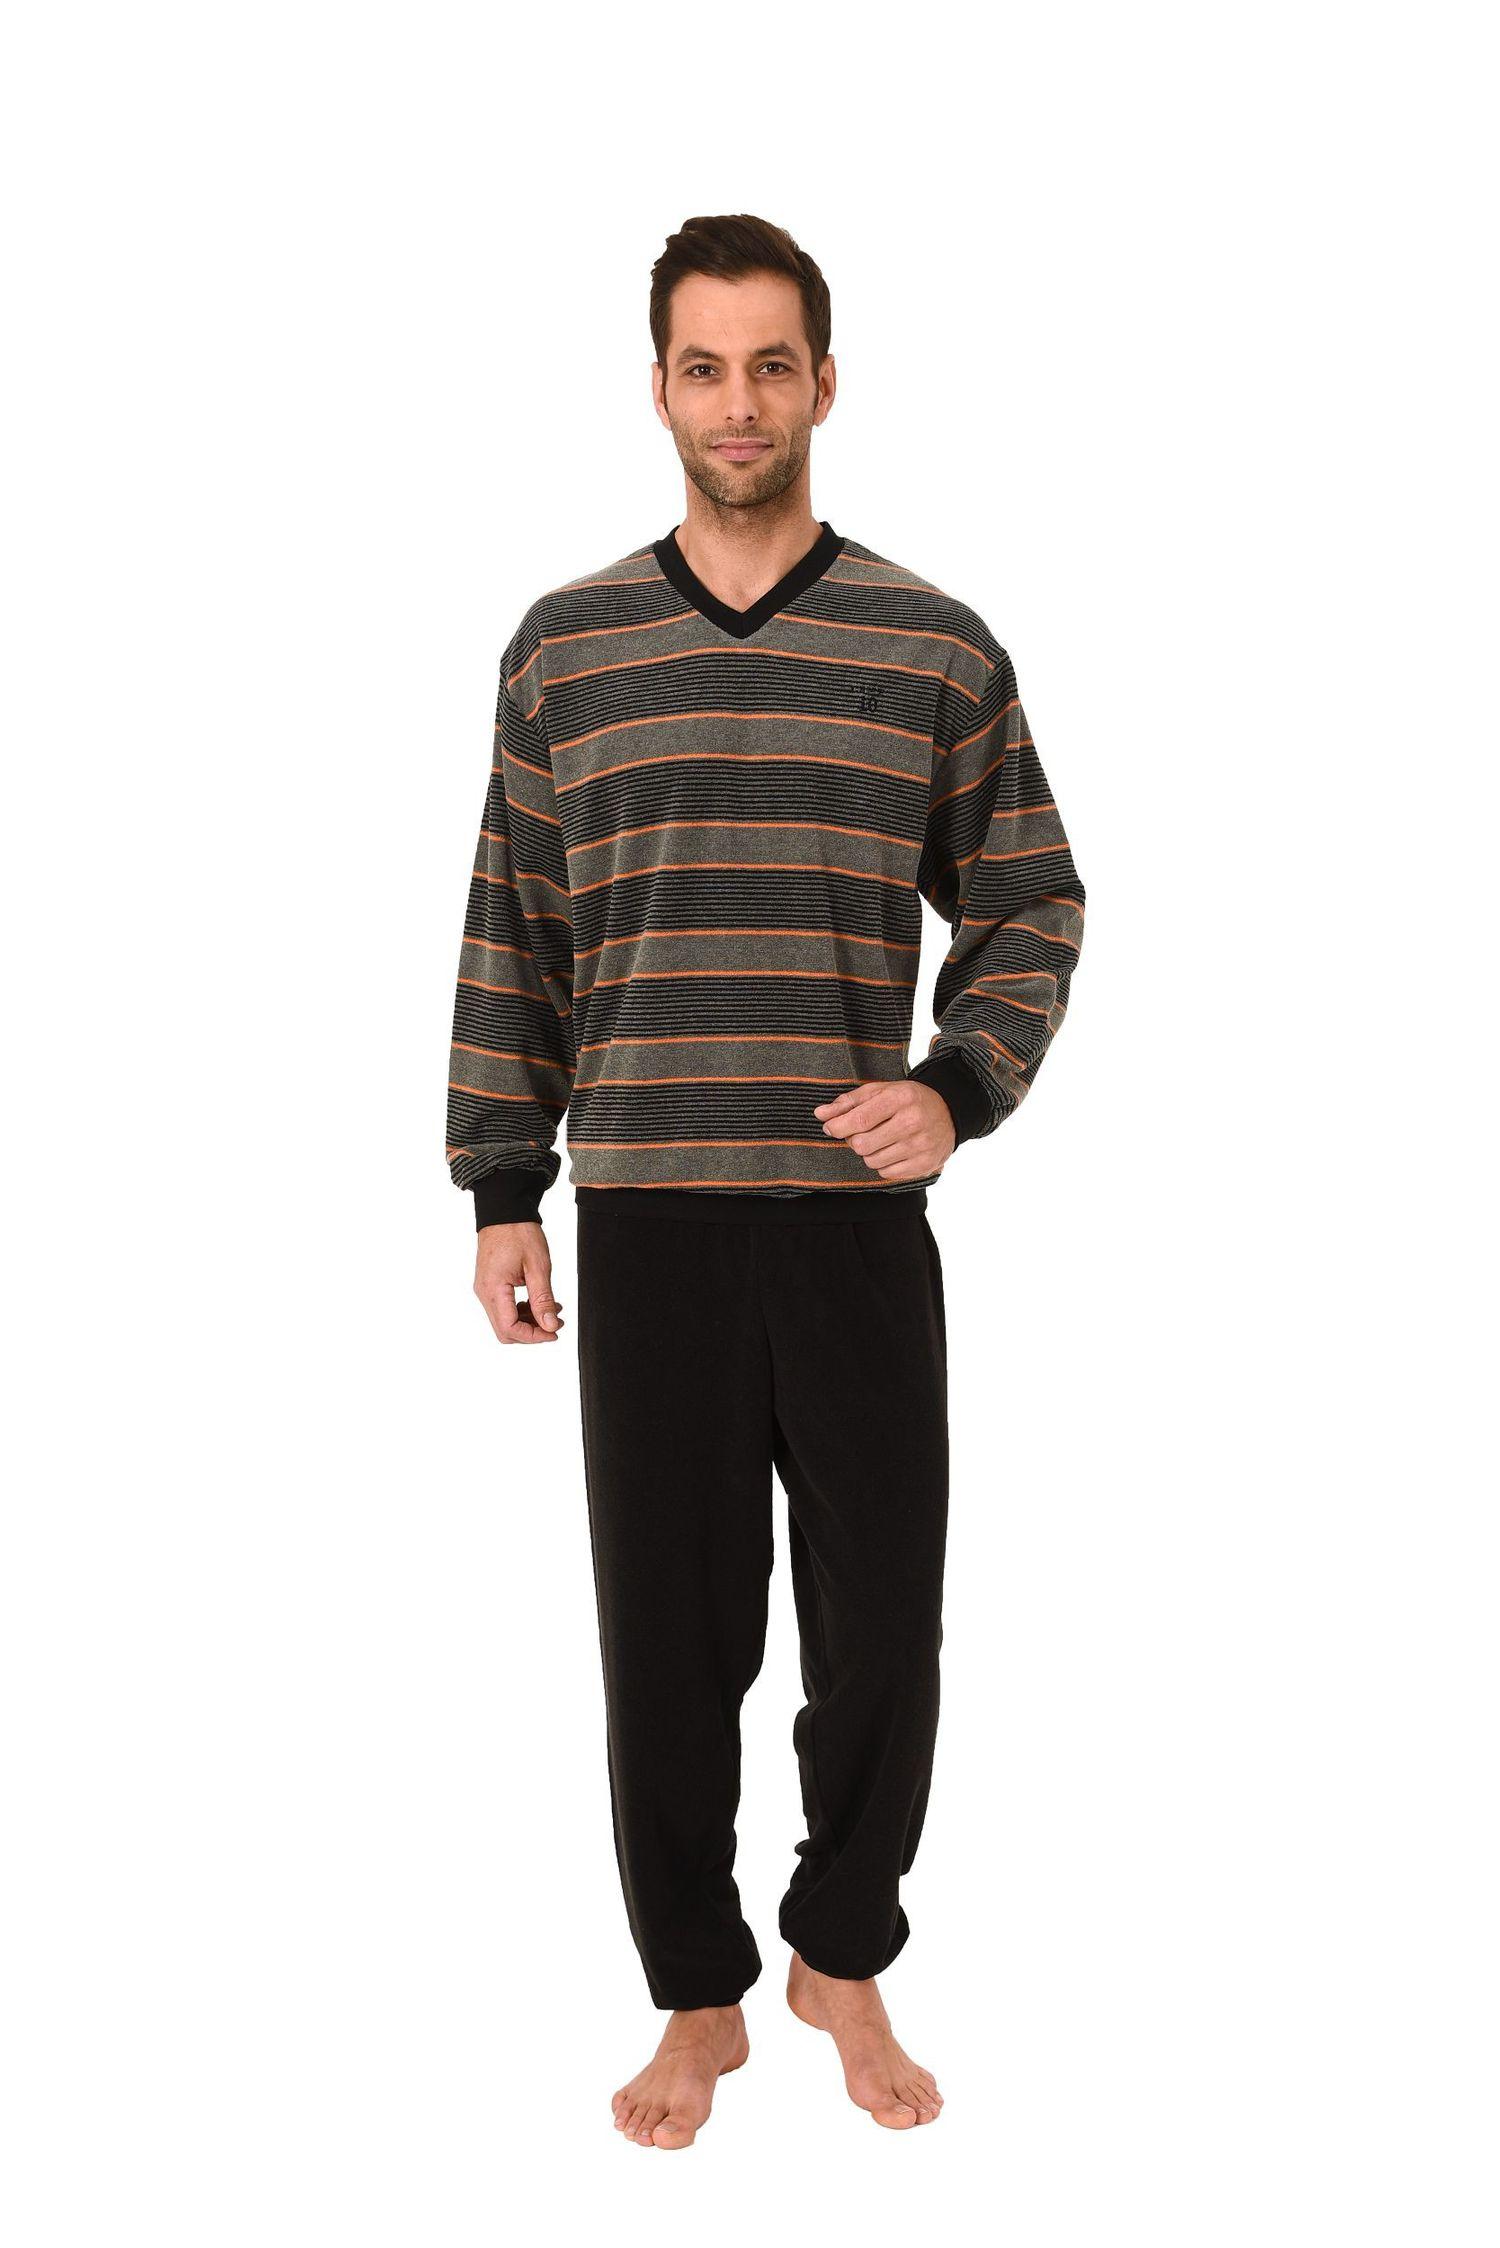 Edler Herren Frottee Pyjama lang mit Bündchen in Streifenoptik – 271 101 93 003 – Bild 1